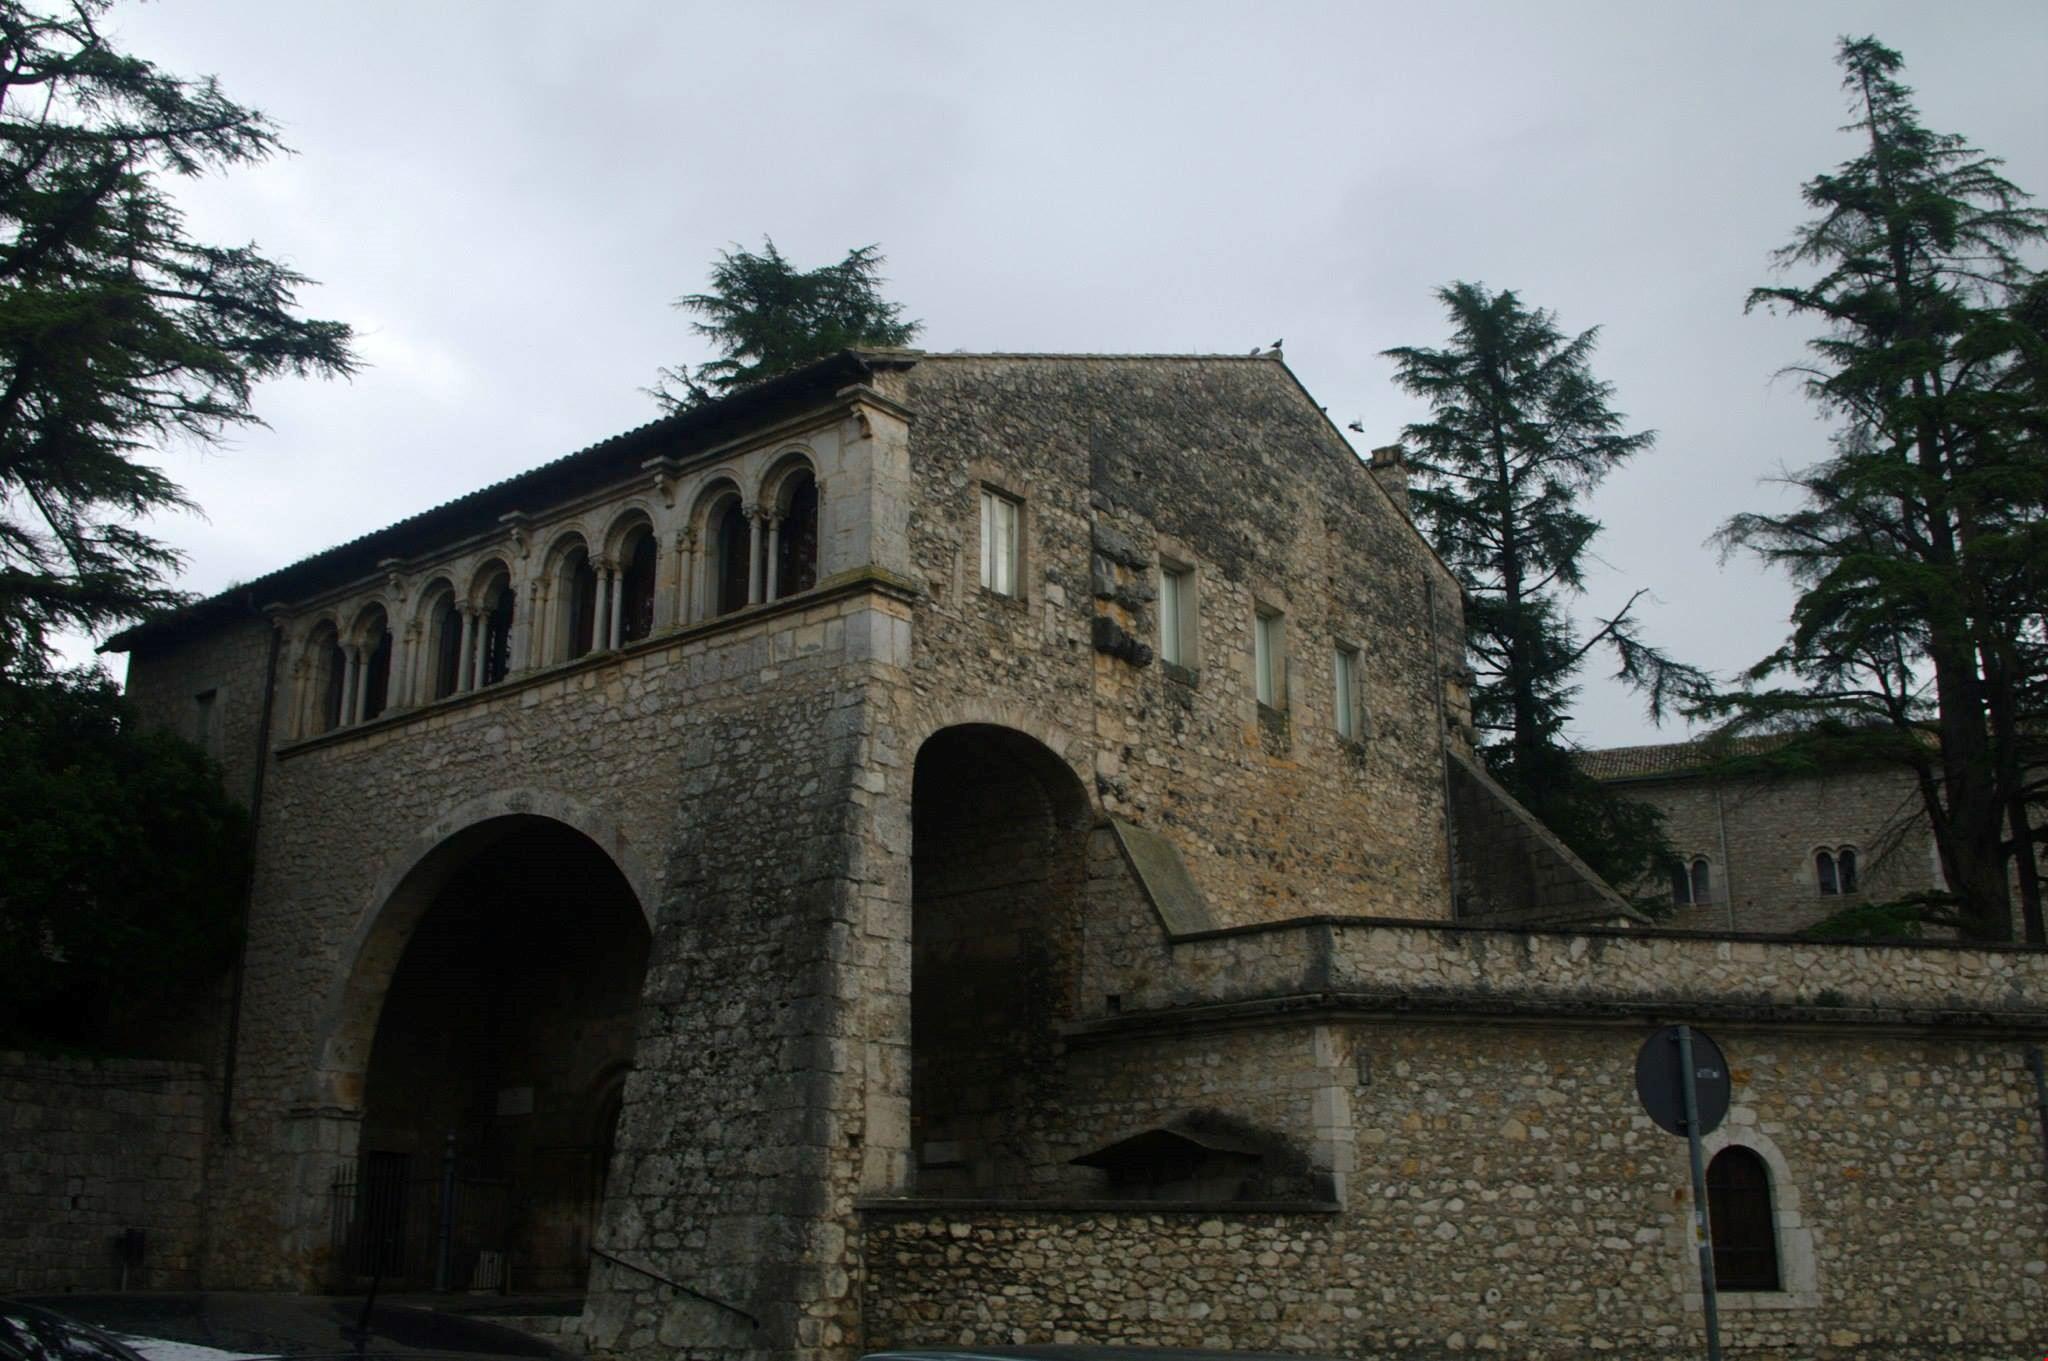 abbazia di casamari